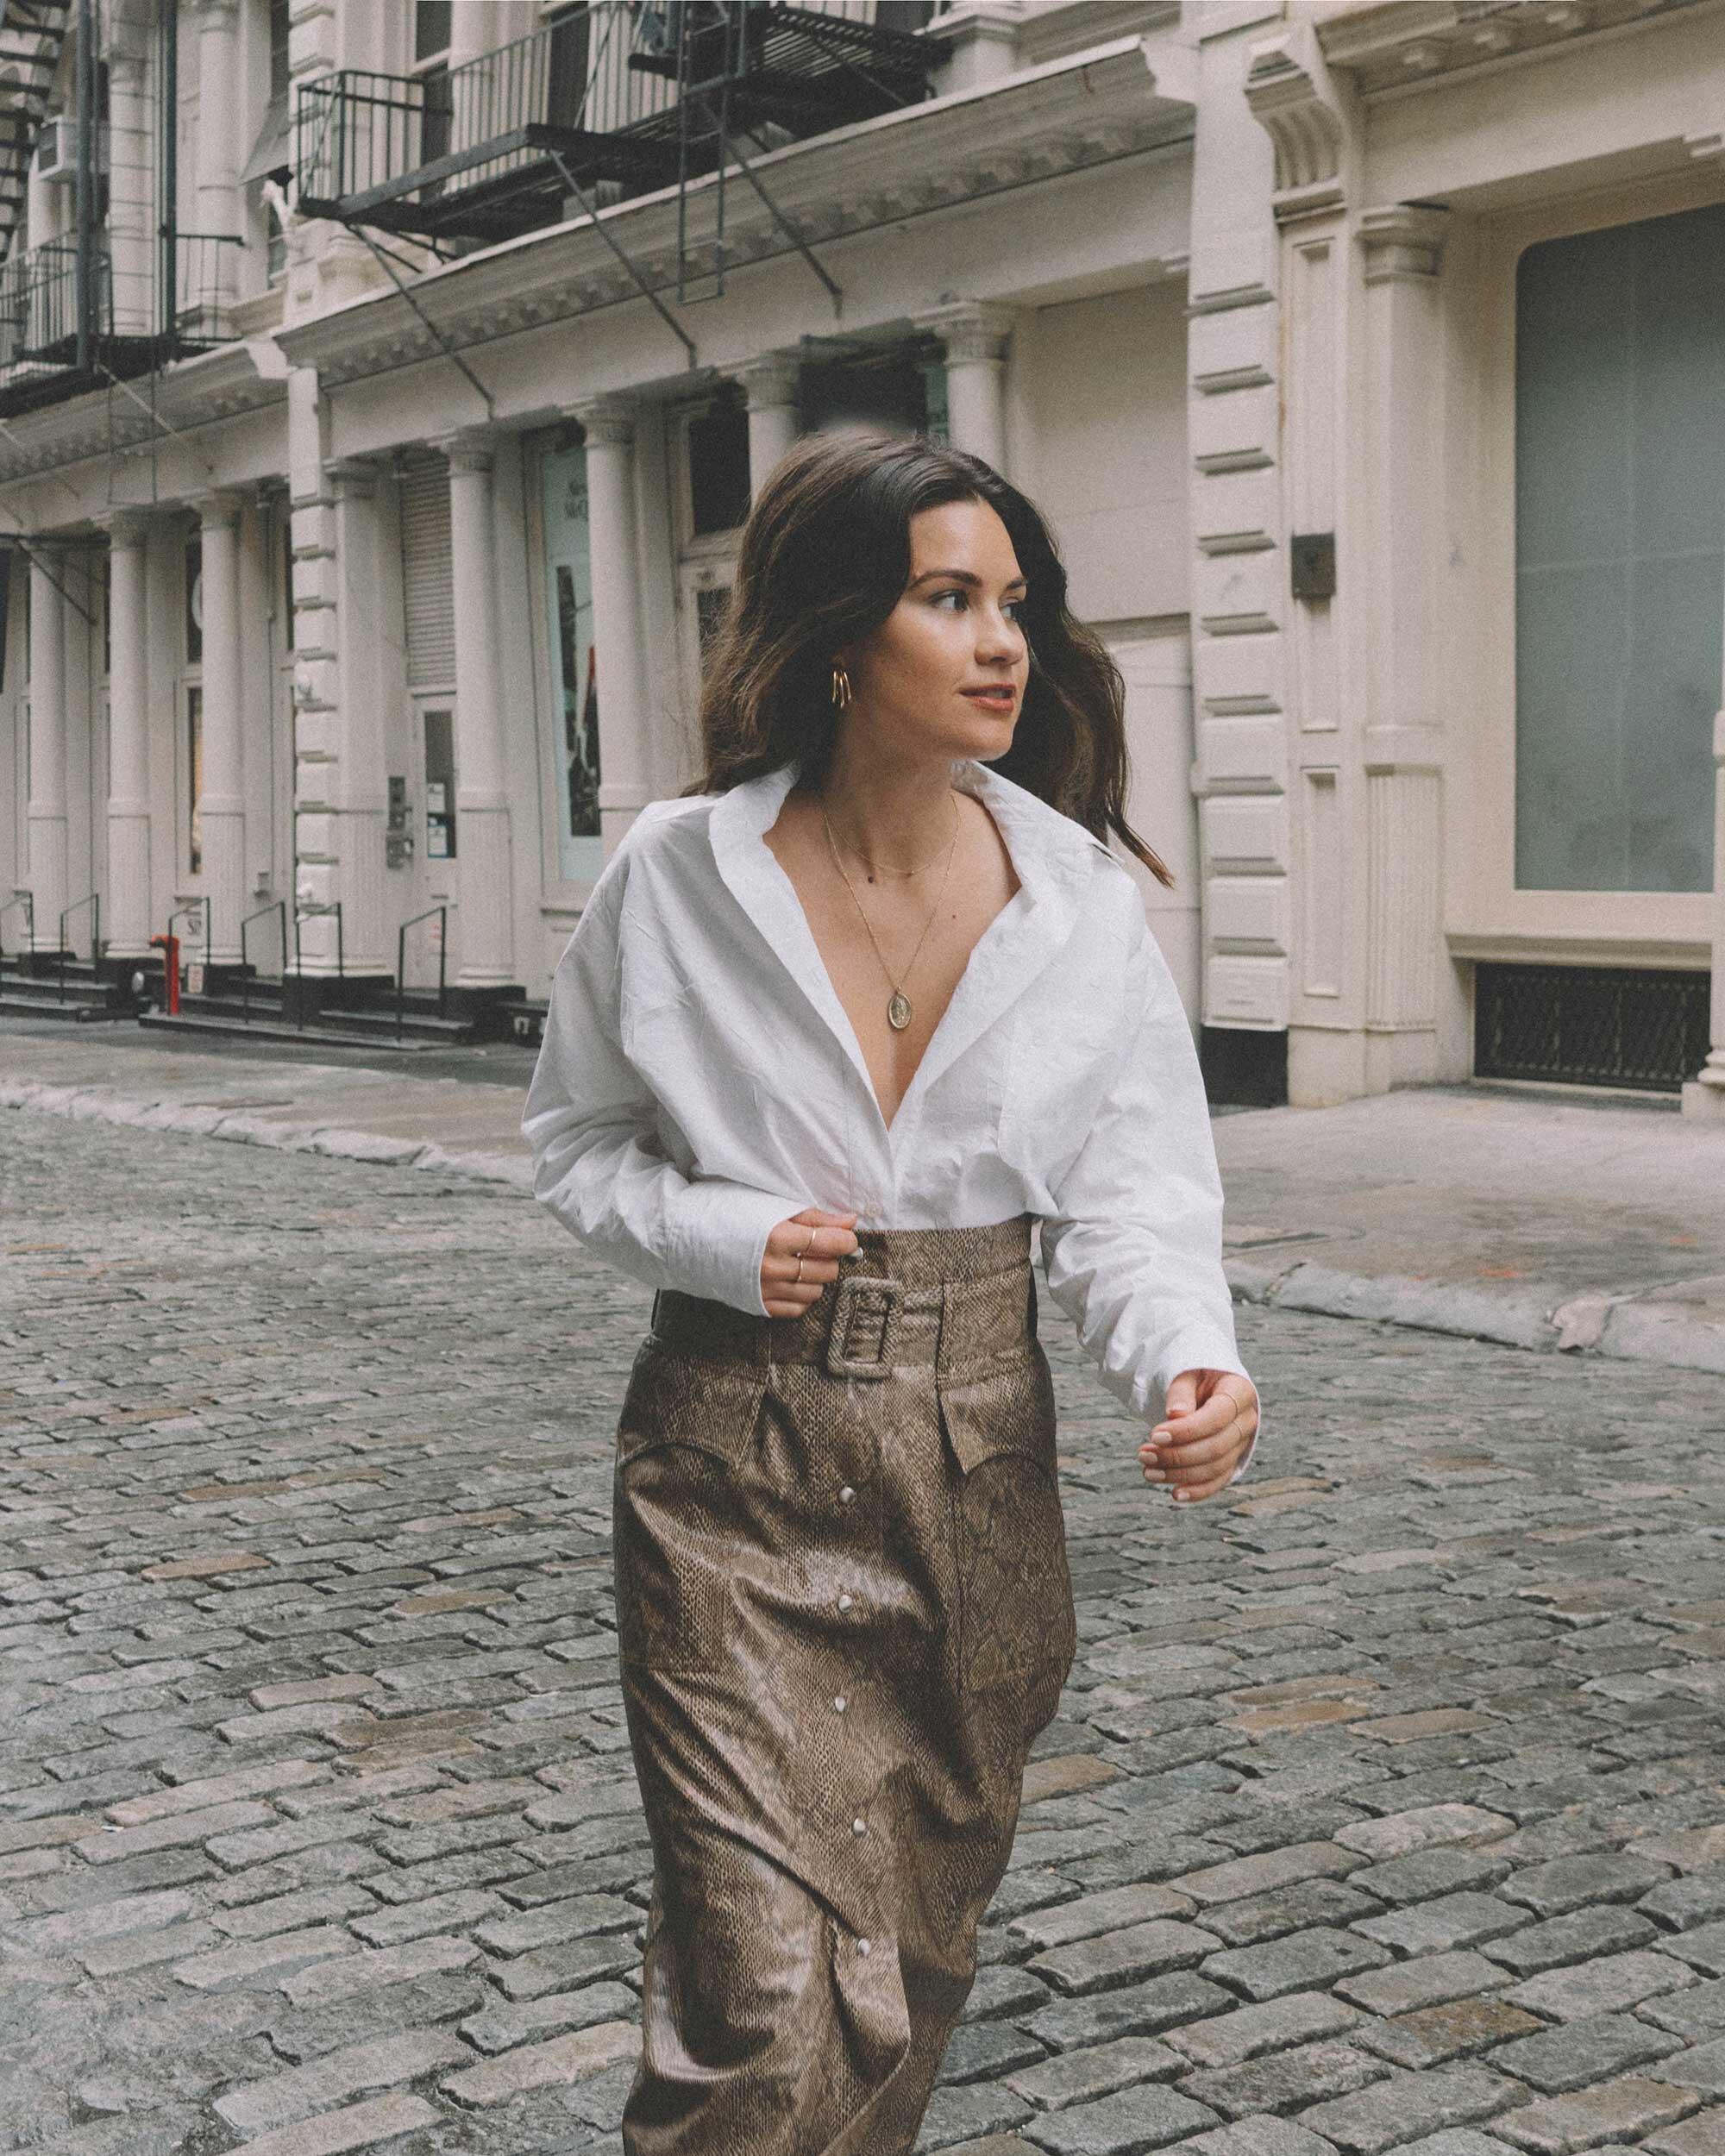 Sarah-Butler-of-Sarah-Styles-Seattle-wears-NANUSHKA-Aarohi-Python-Print-Vegan-Leather-Midi-Skirt-_-@sarahchristine--4.jpg